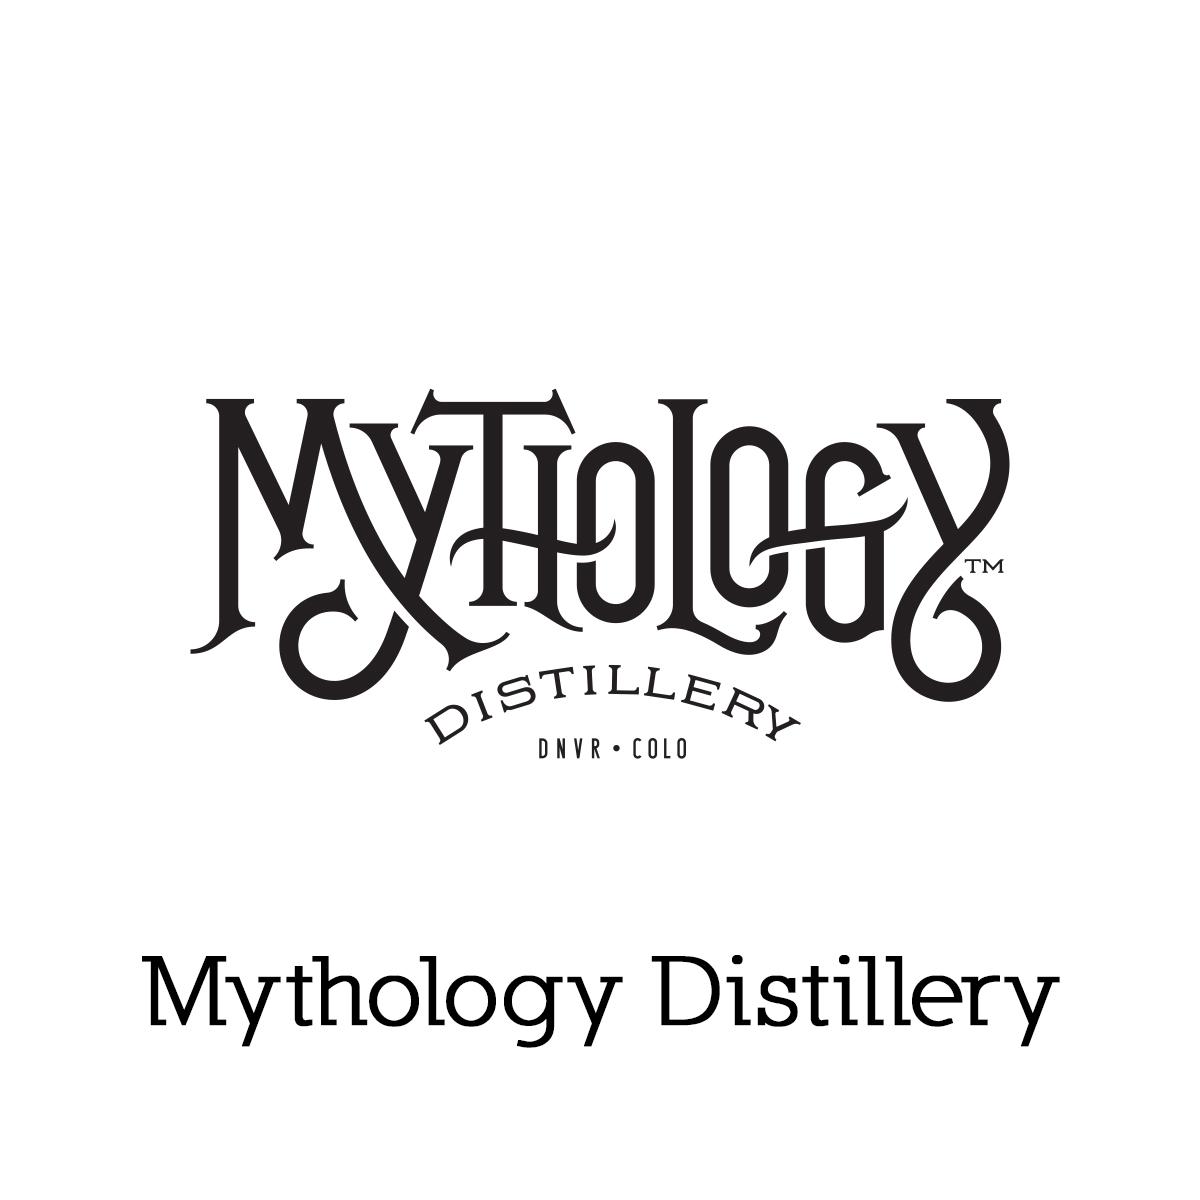 mythology-distillery_resized-for-web.jpg